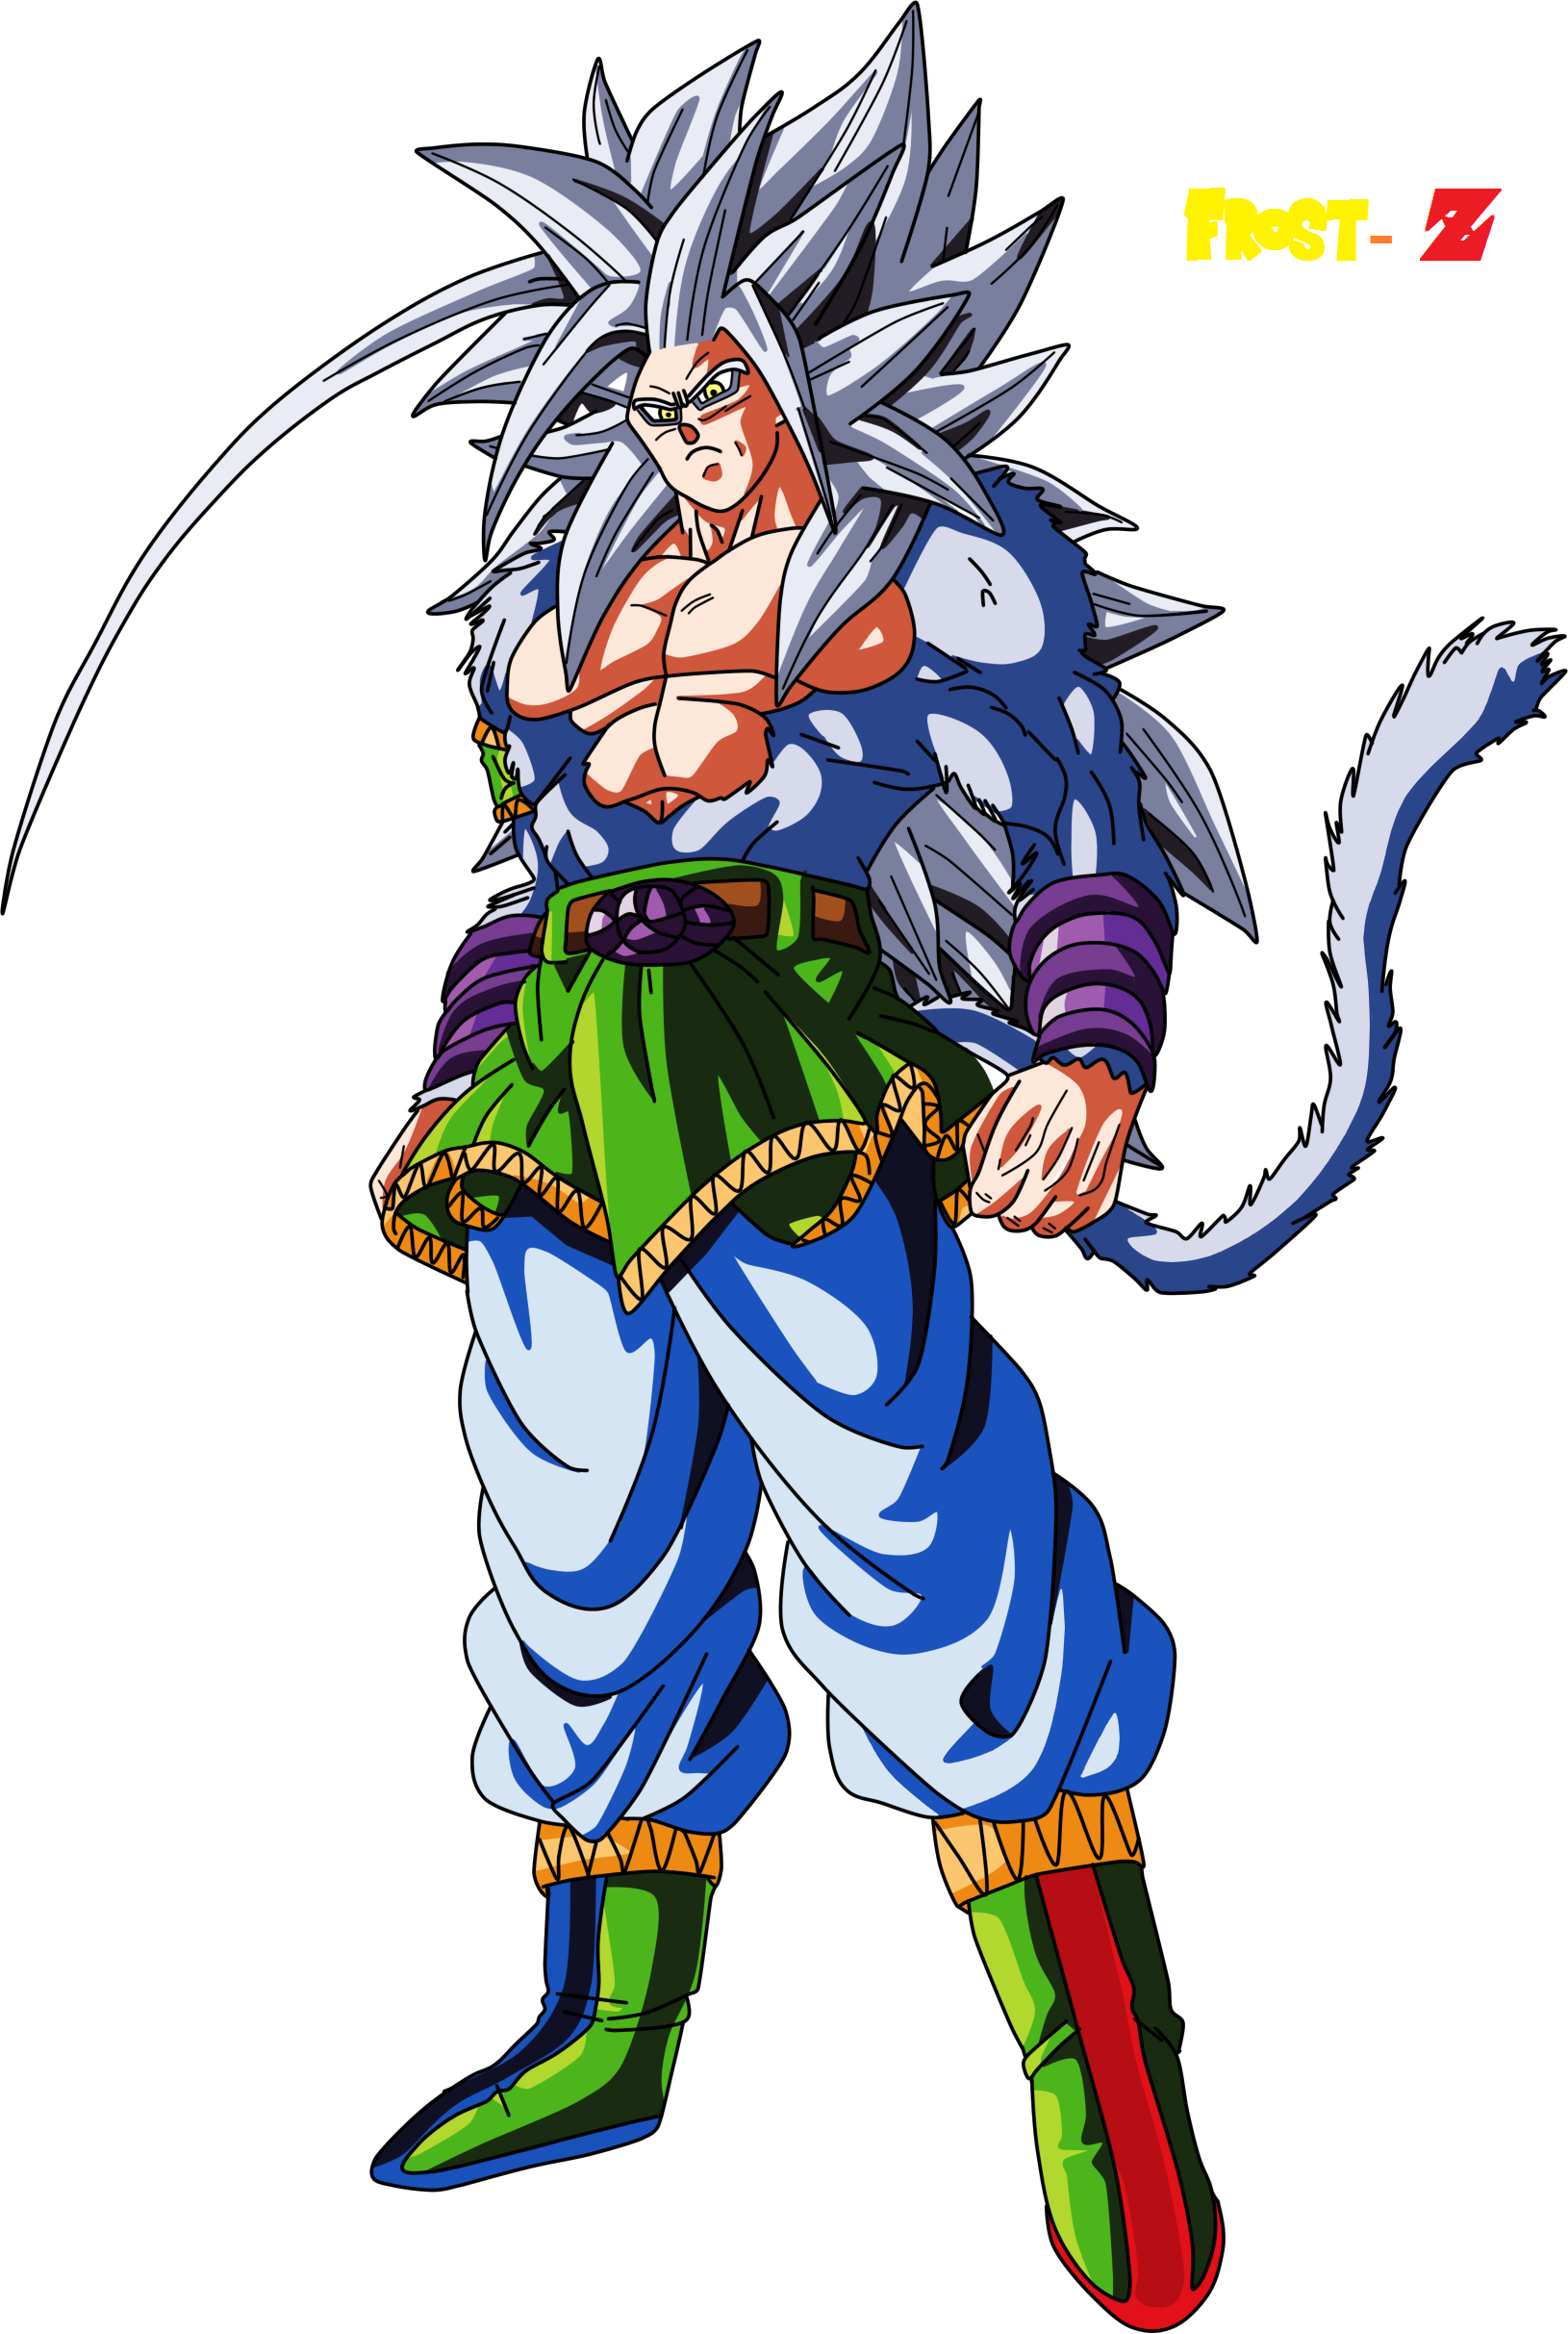 Goku super saiyan 5 by frost z on deviantart - Goku super sayan 5 ...